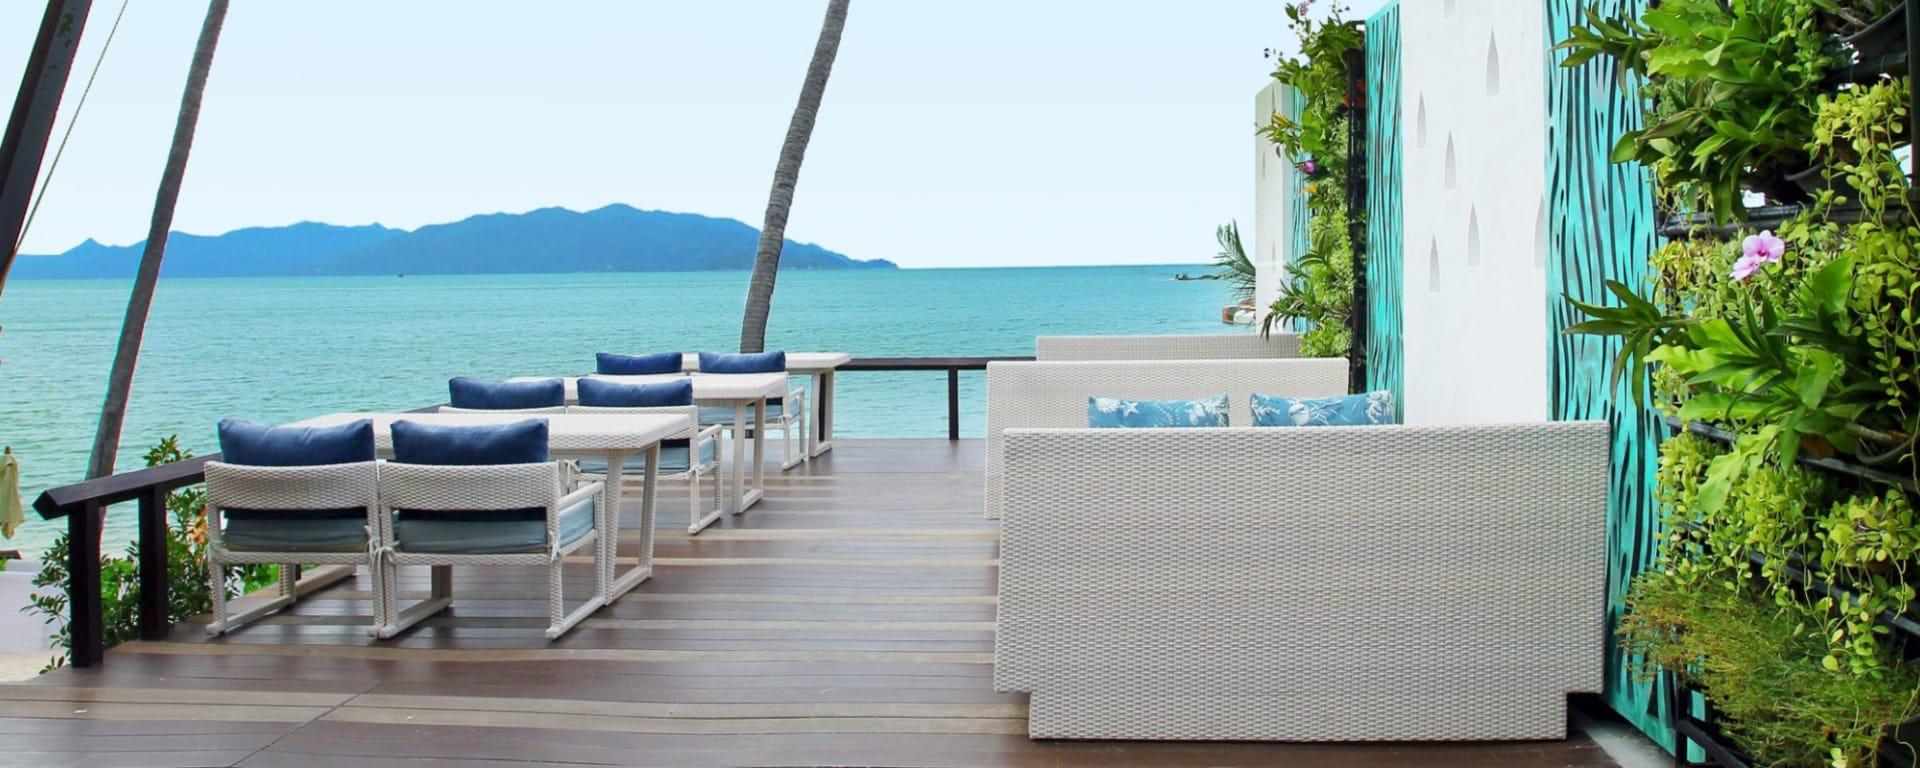 Melati Beach Resort & Spa in Ko Samui: The View